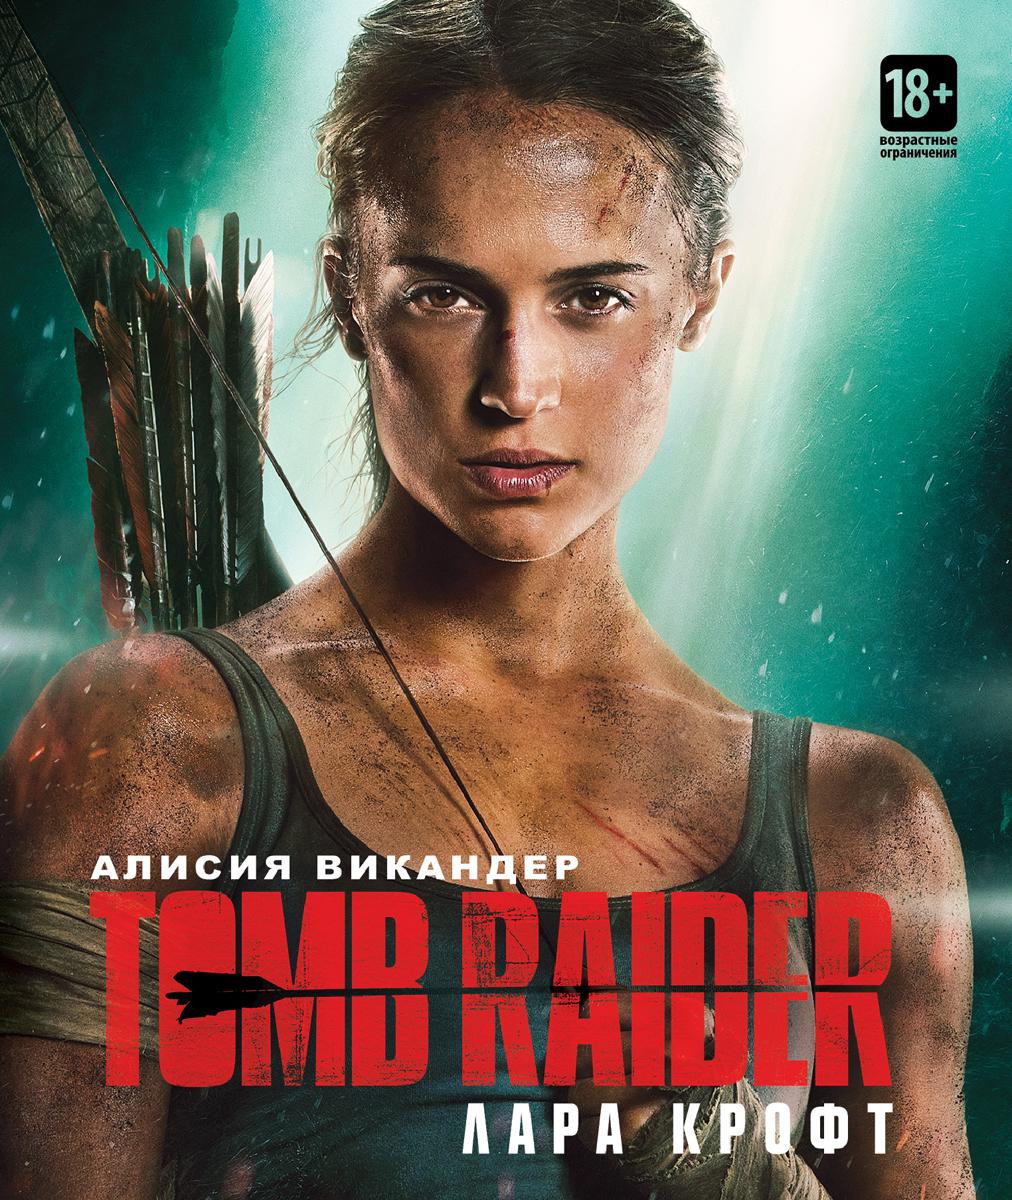 Tomb Raider: Лара Крофт (Blu-ray) лара джэйд модная фотосъемка руководство для fashion фотографов